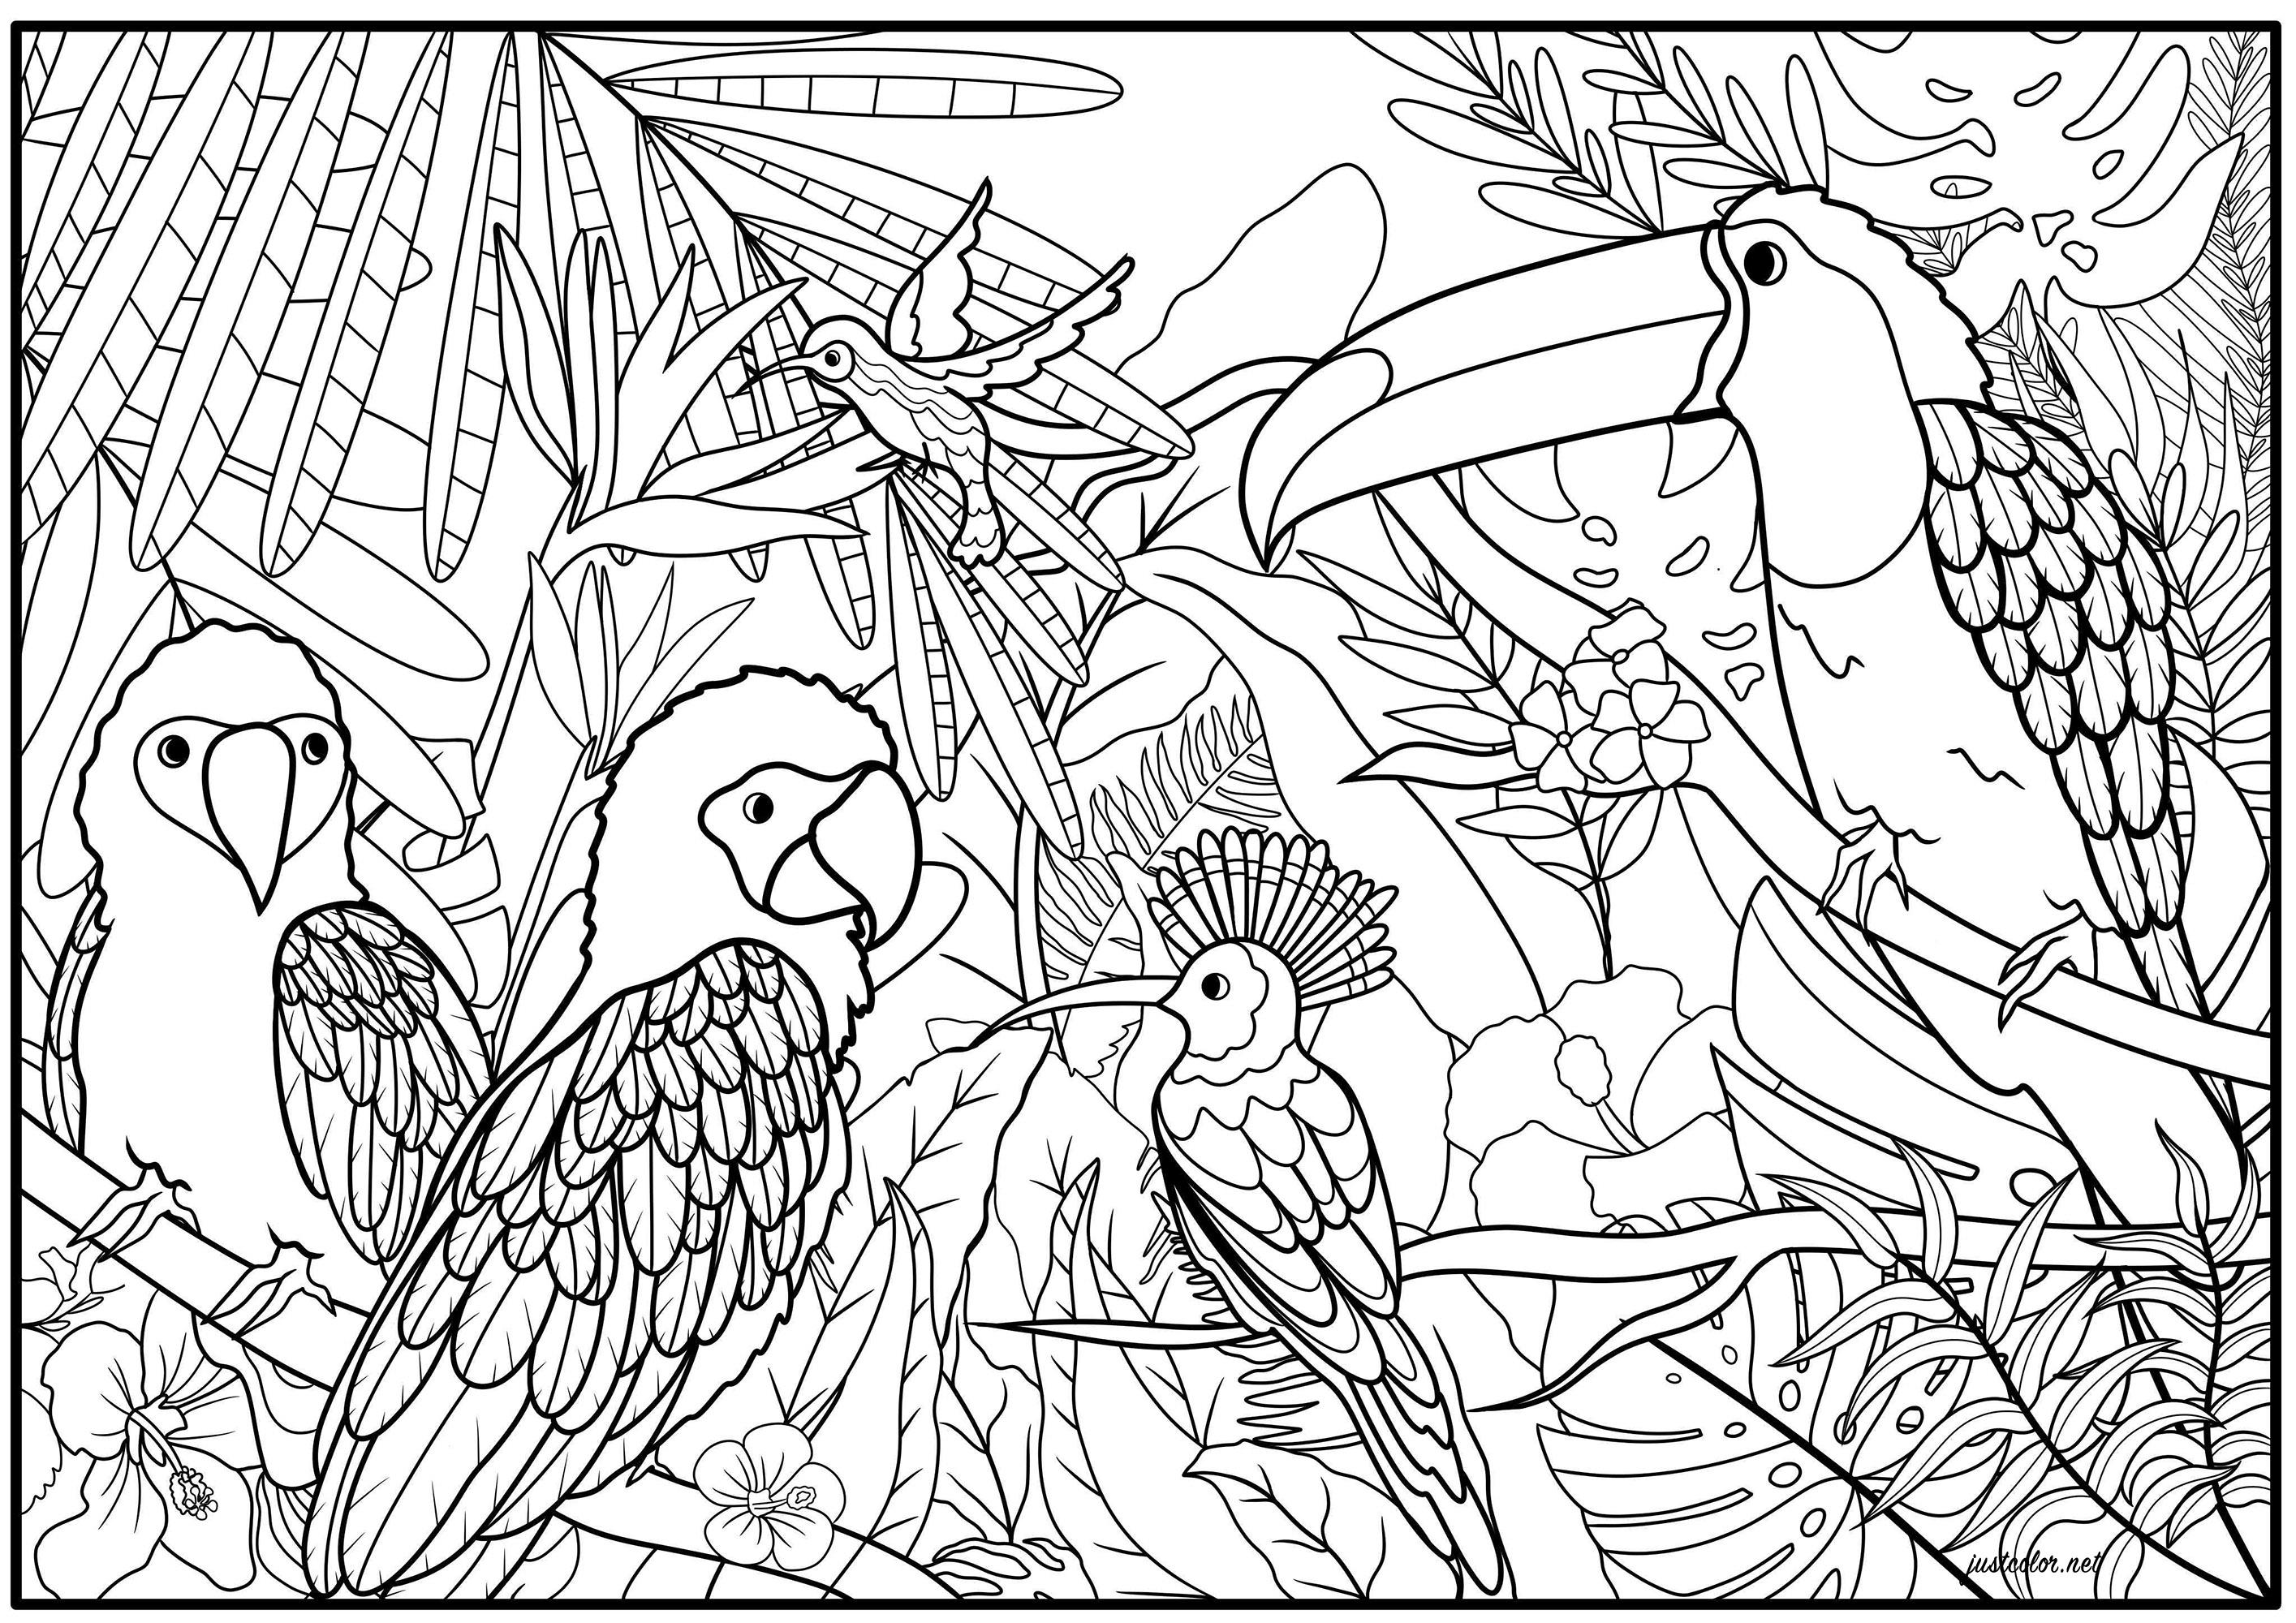 Malbuch Fur Erwachsene : Vögel - 2